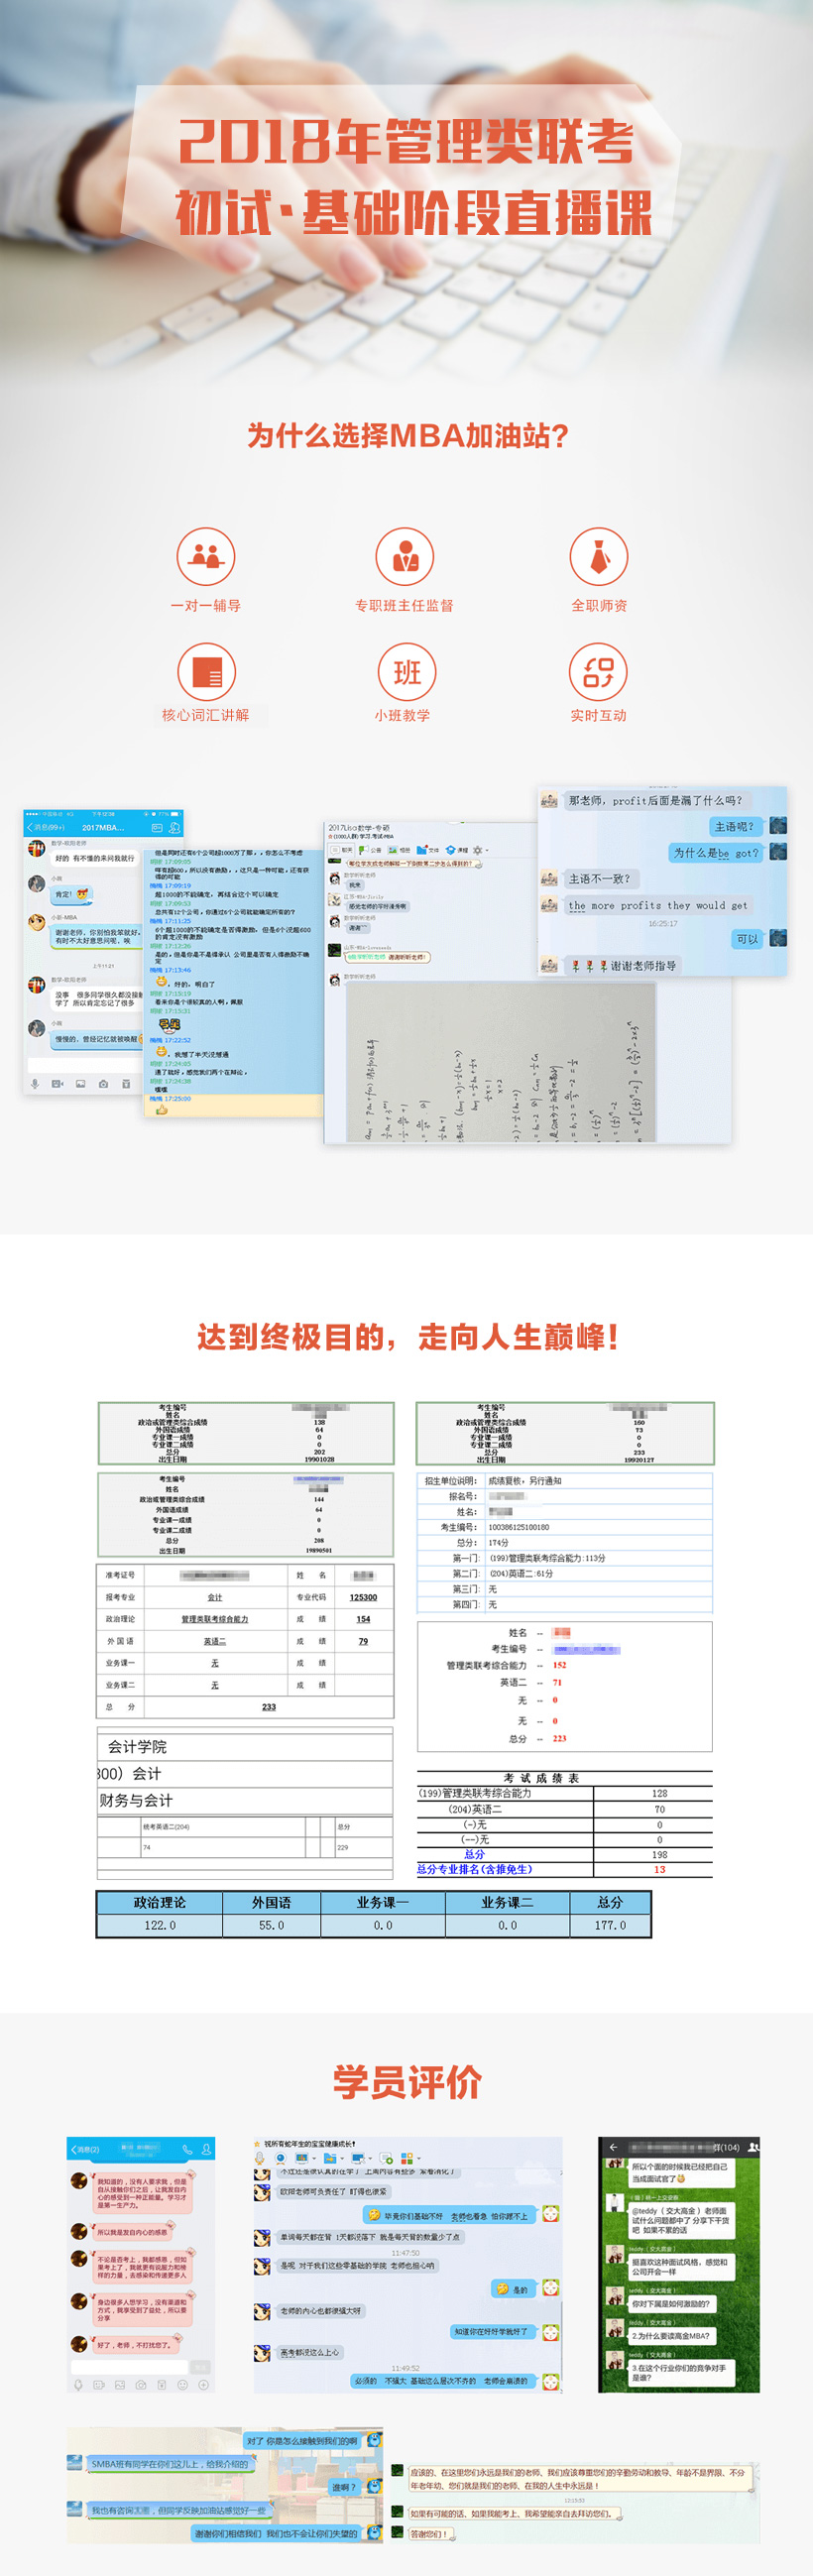 page-detail-1.jpg